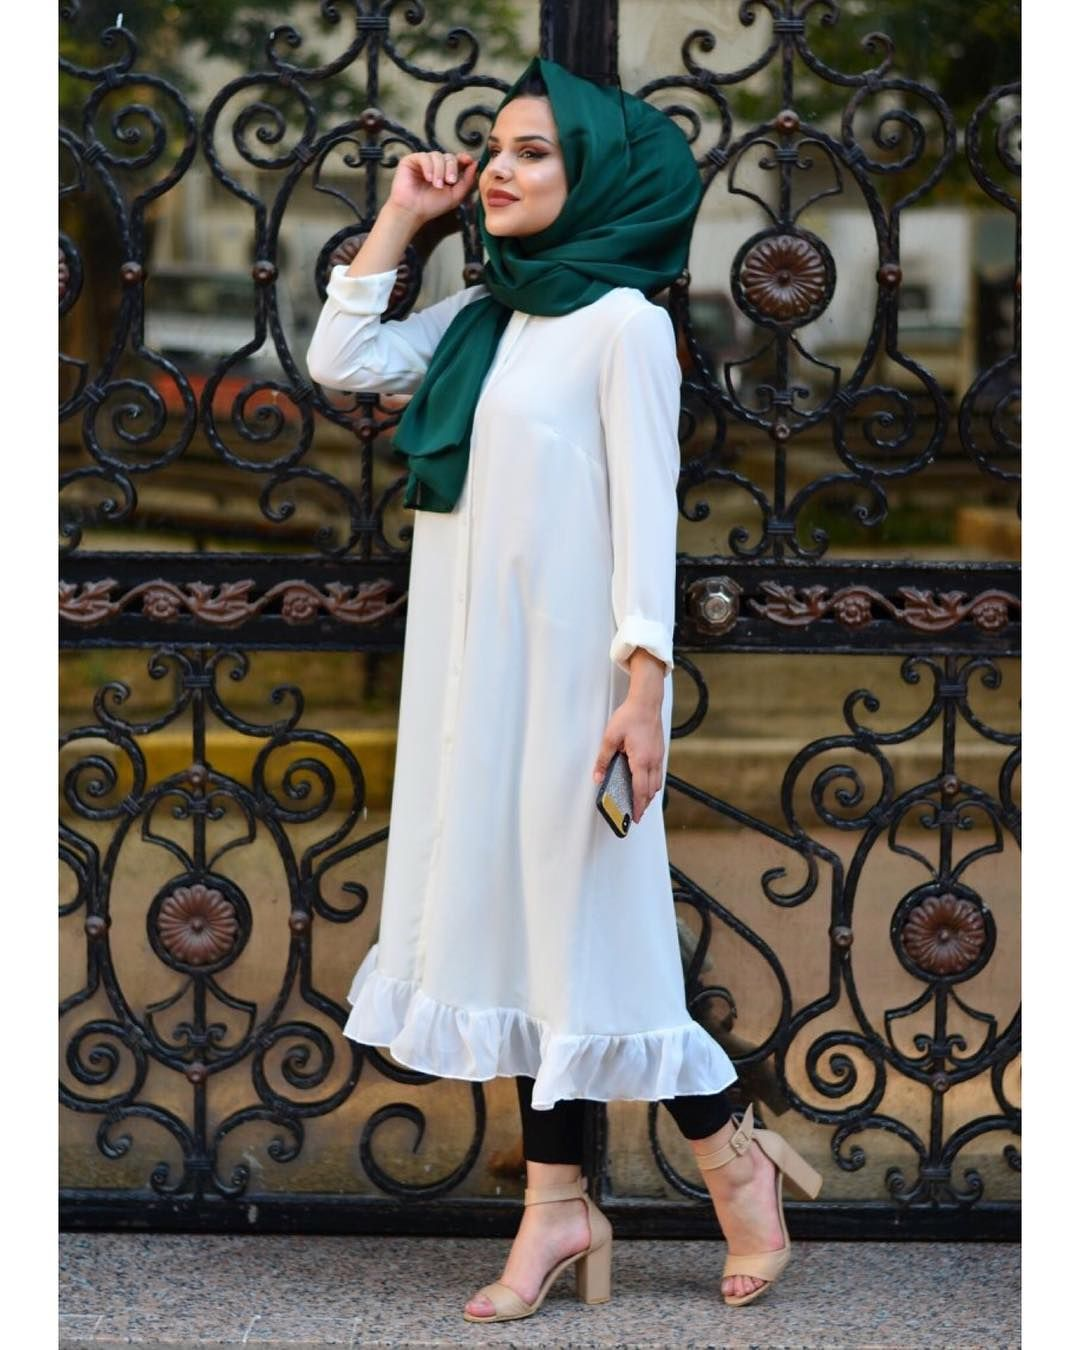 Genc Tesettur Buyuk Beden Giyim Sirlari Kilolu Tesetturlu Bayanlar Ici Tesettur Modasi 2020 Size Clothing Clothes Fashion